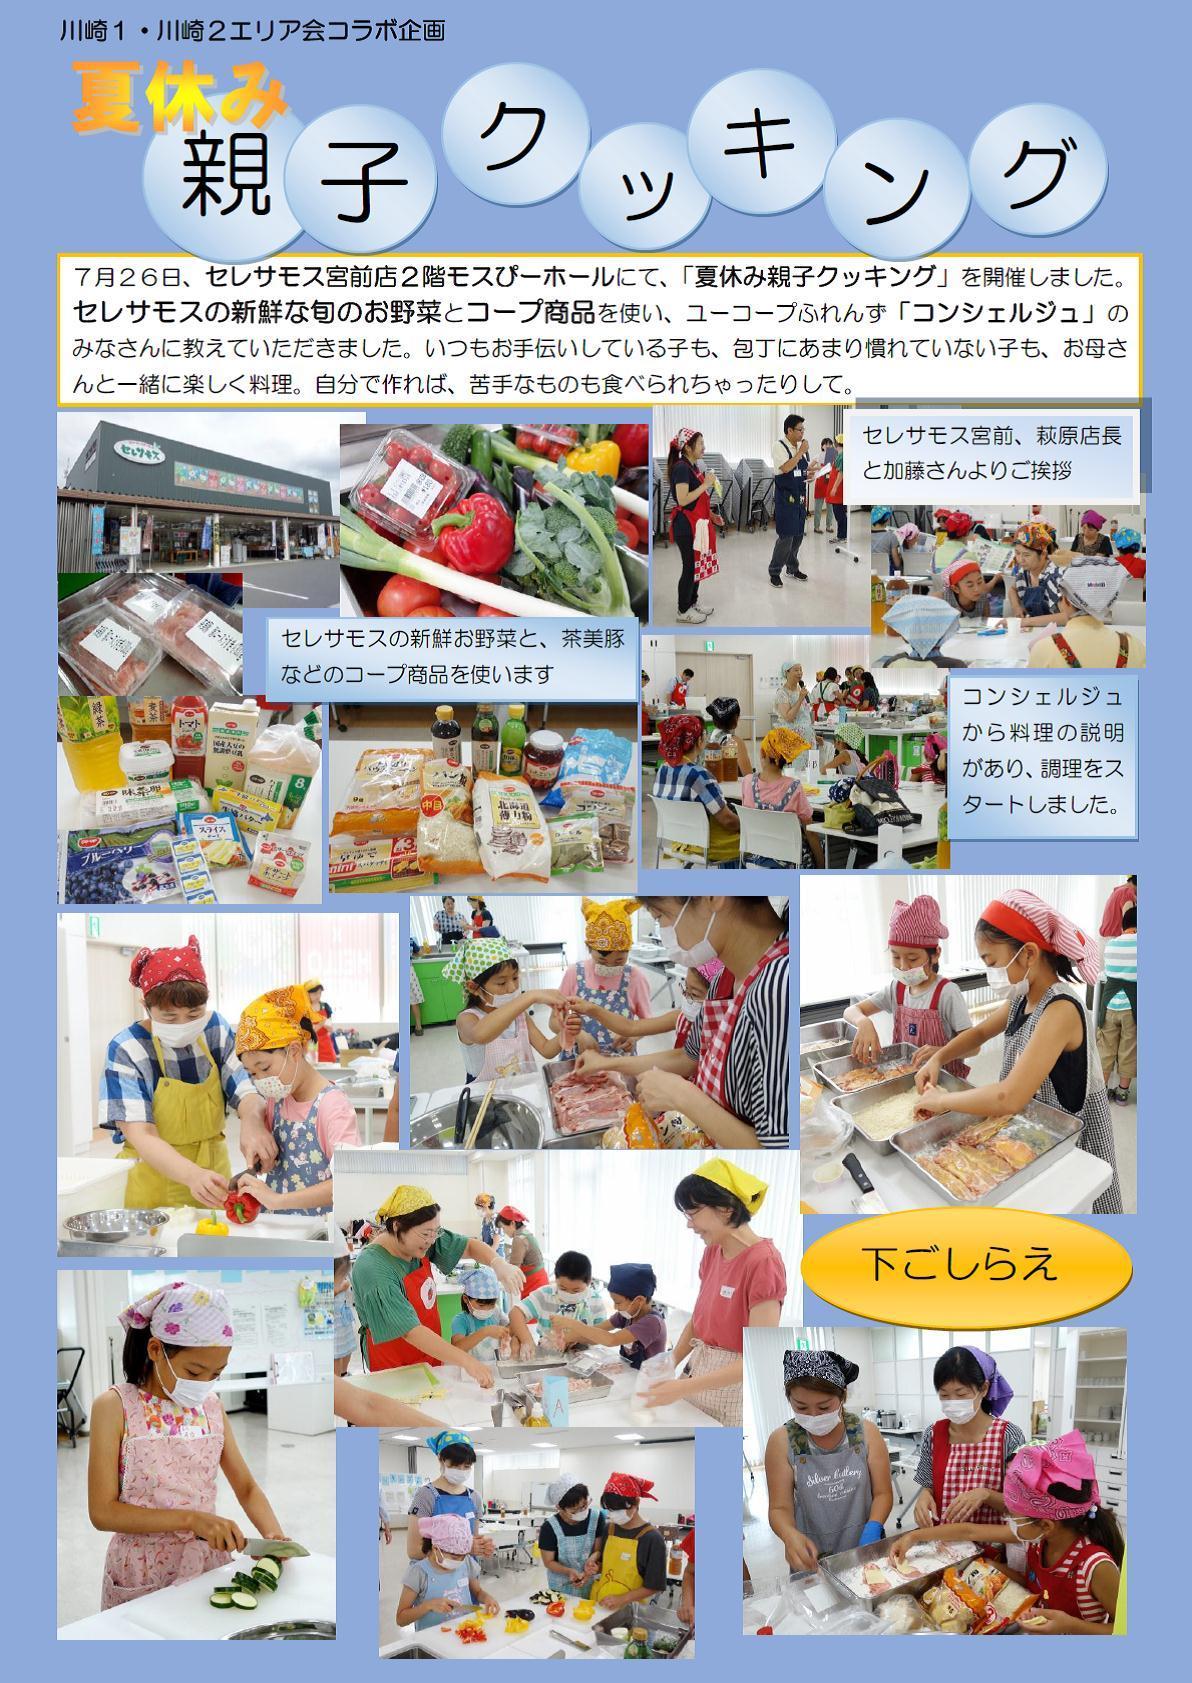 http://kanagawa.ucoop.or.jp/hiroba/areanews/files/9a79906a9f1190a994b5b5fb152f228e_1.jpg